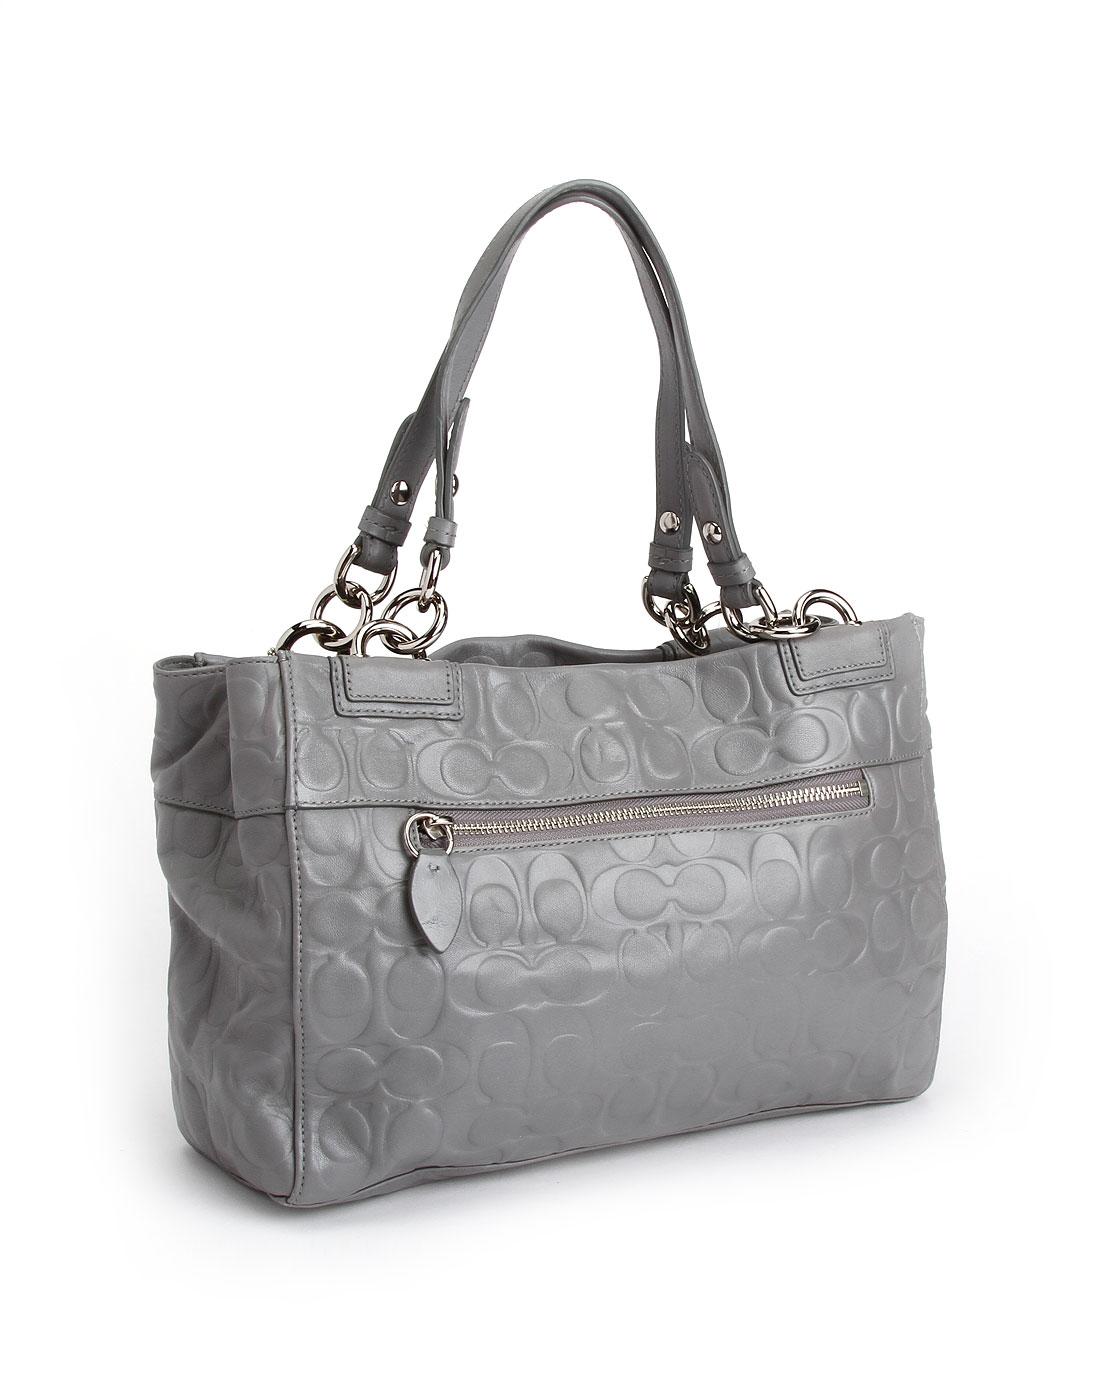 coach女款灰色时尚手提包f16577sgysv